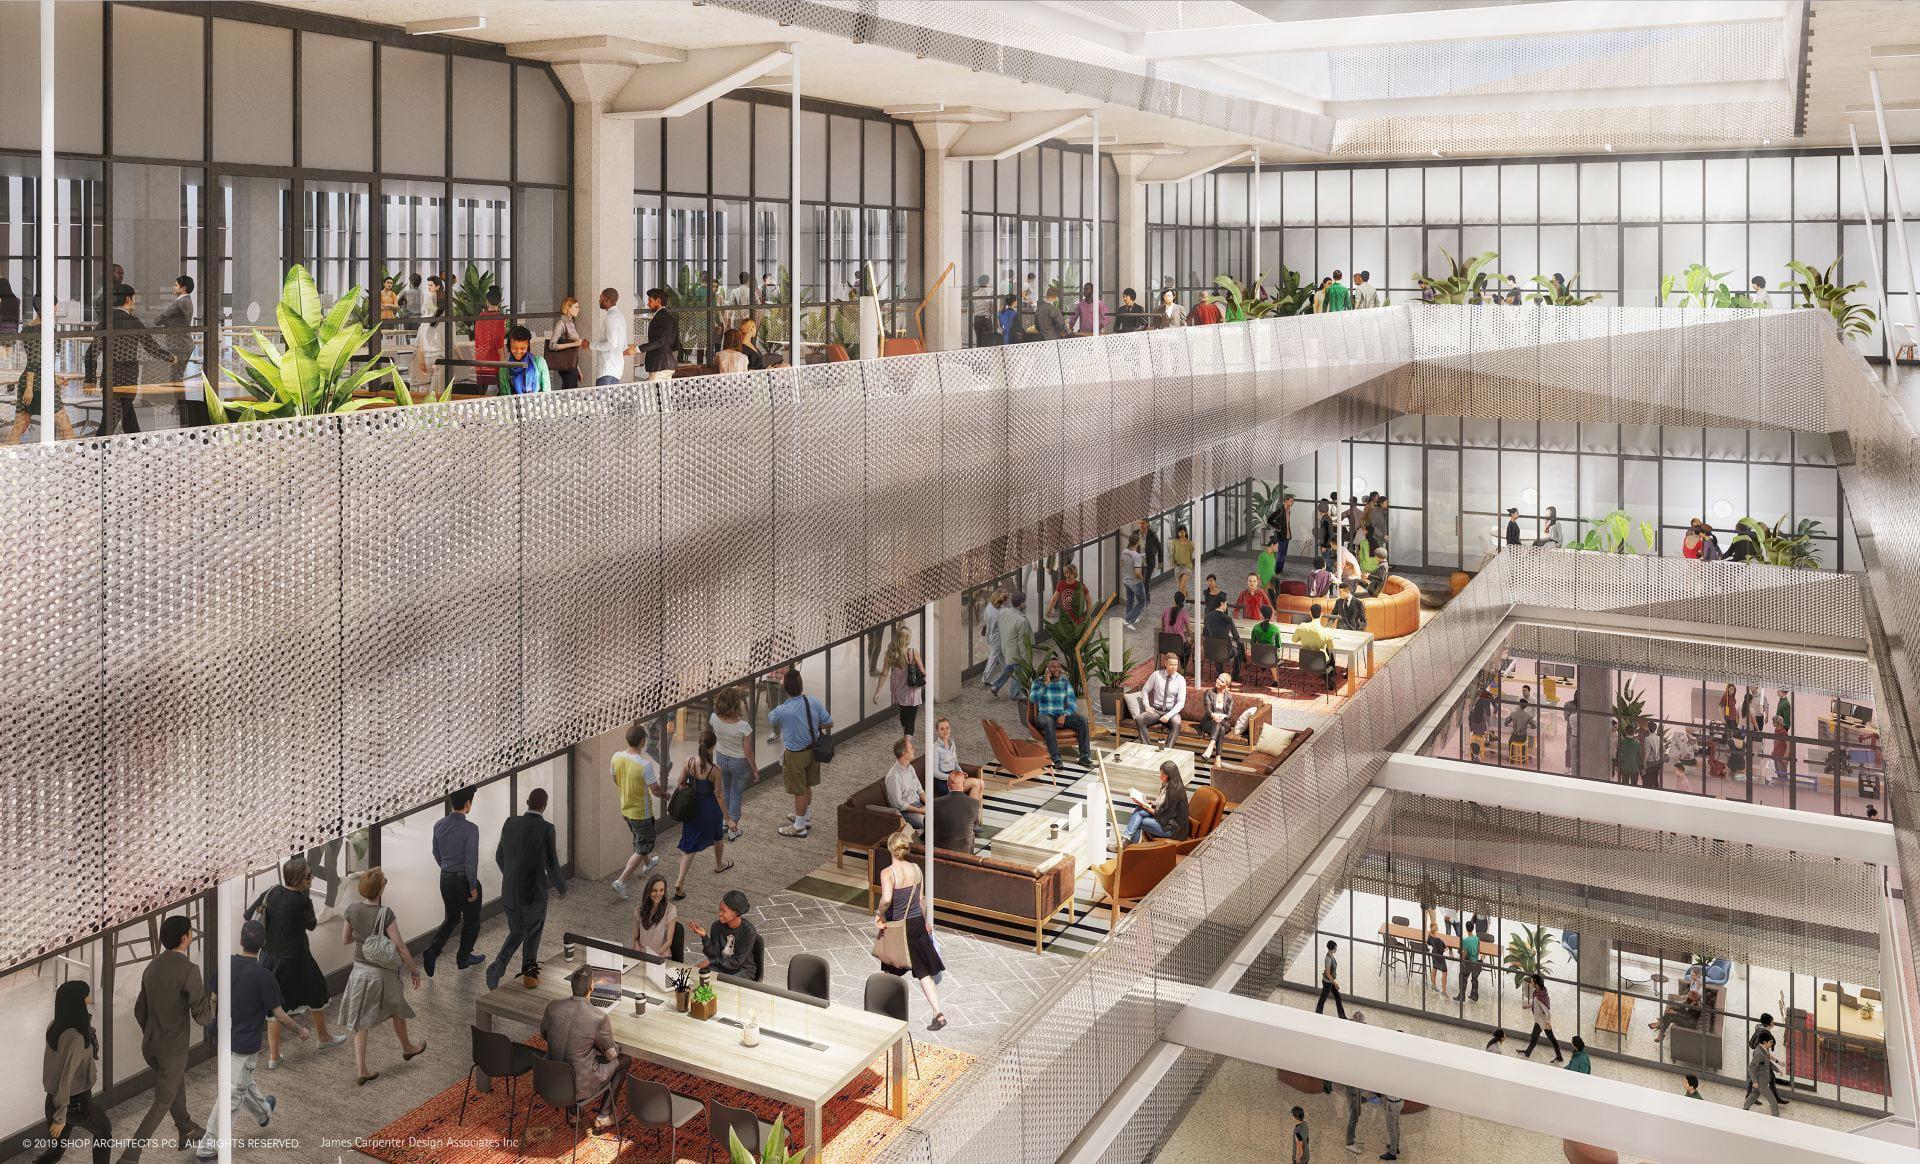 Rice University-led Ion innovation district breaks ground